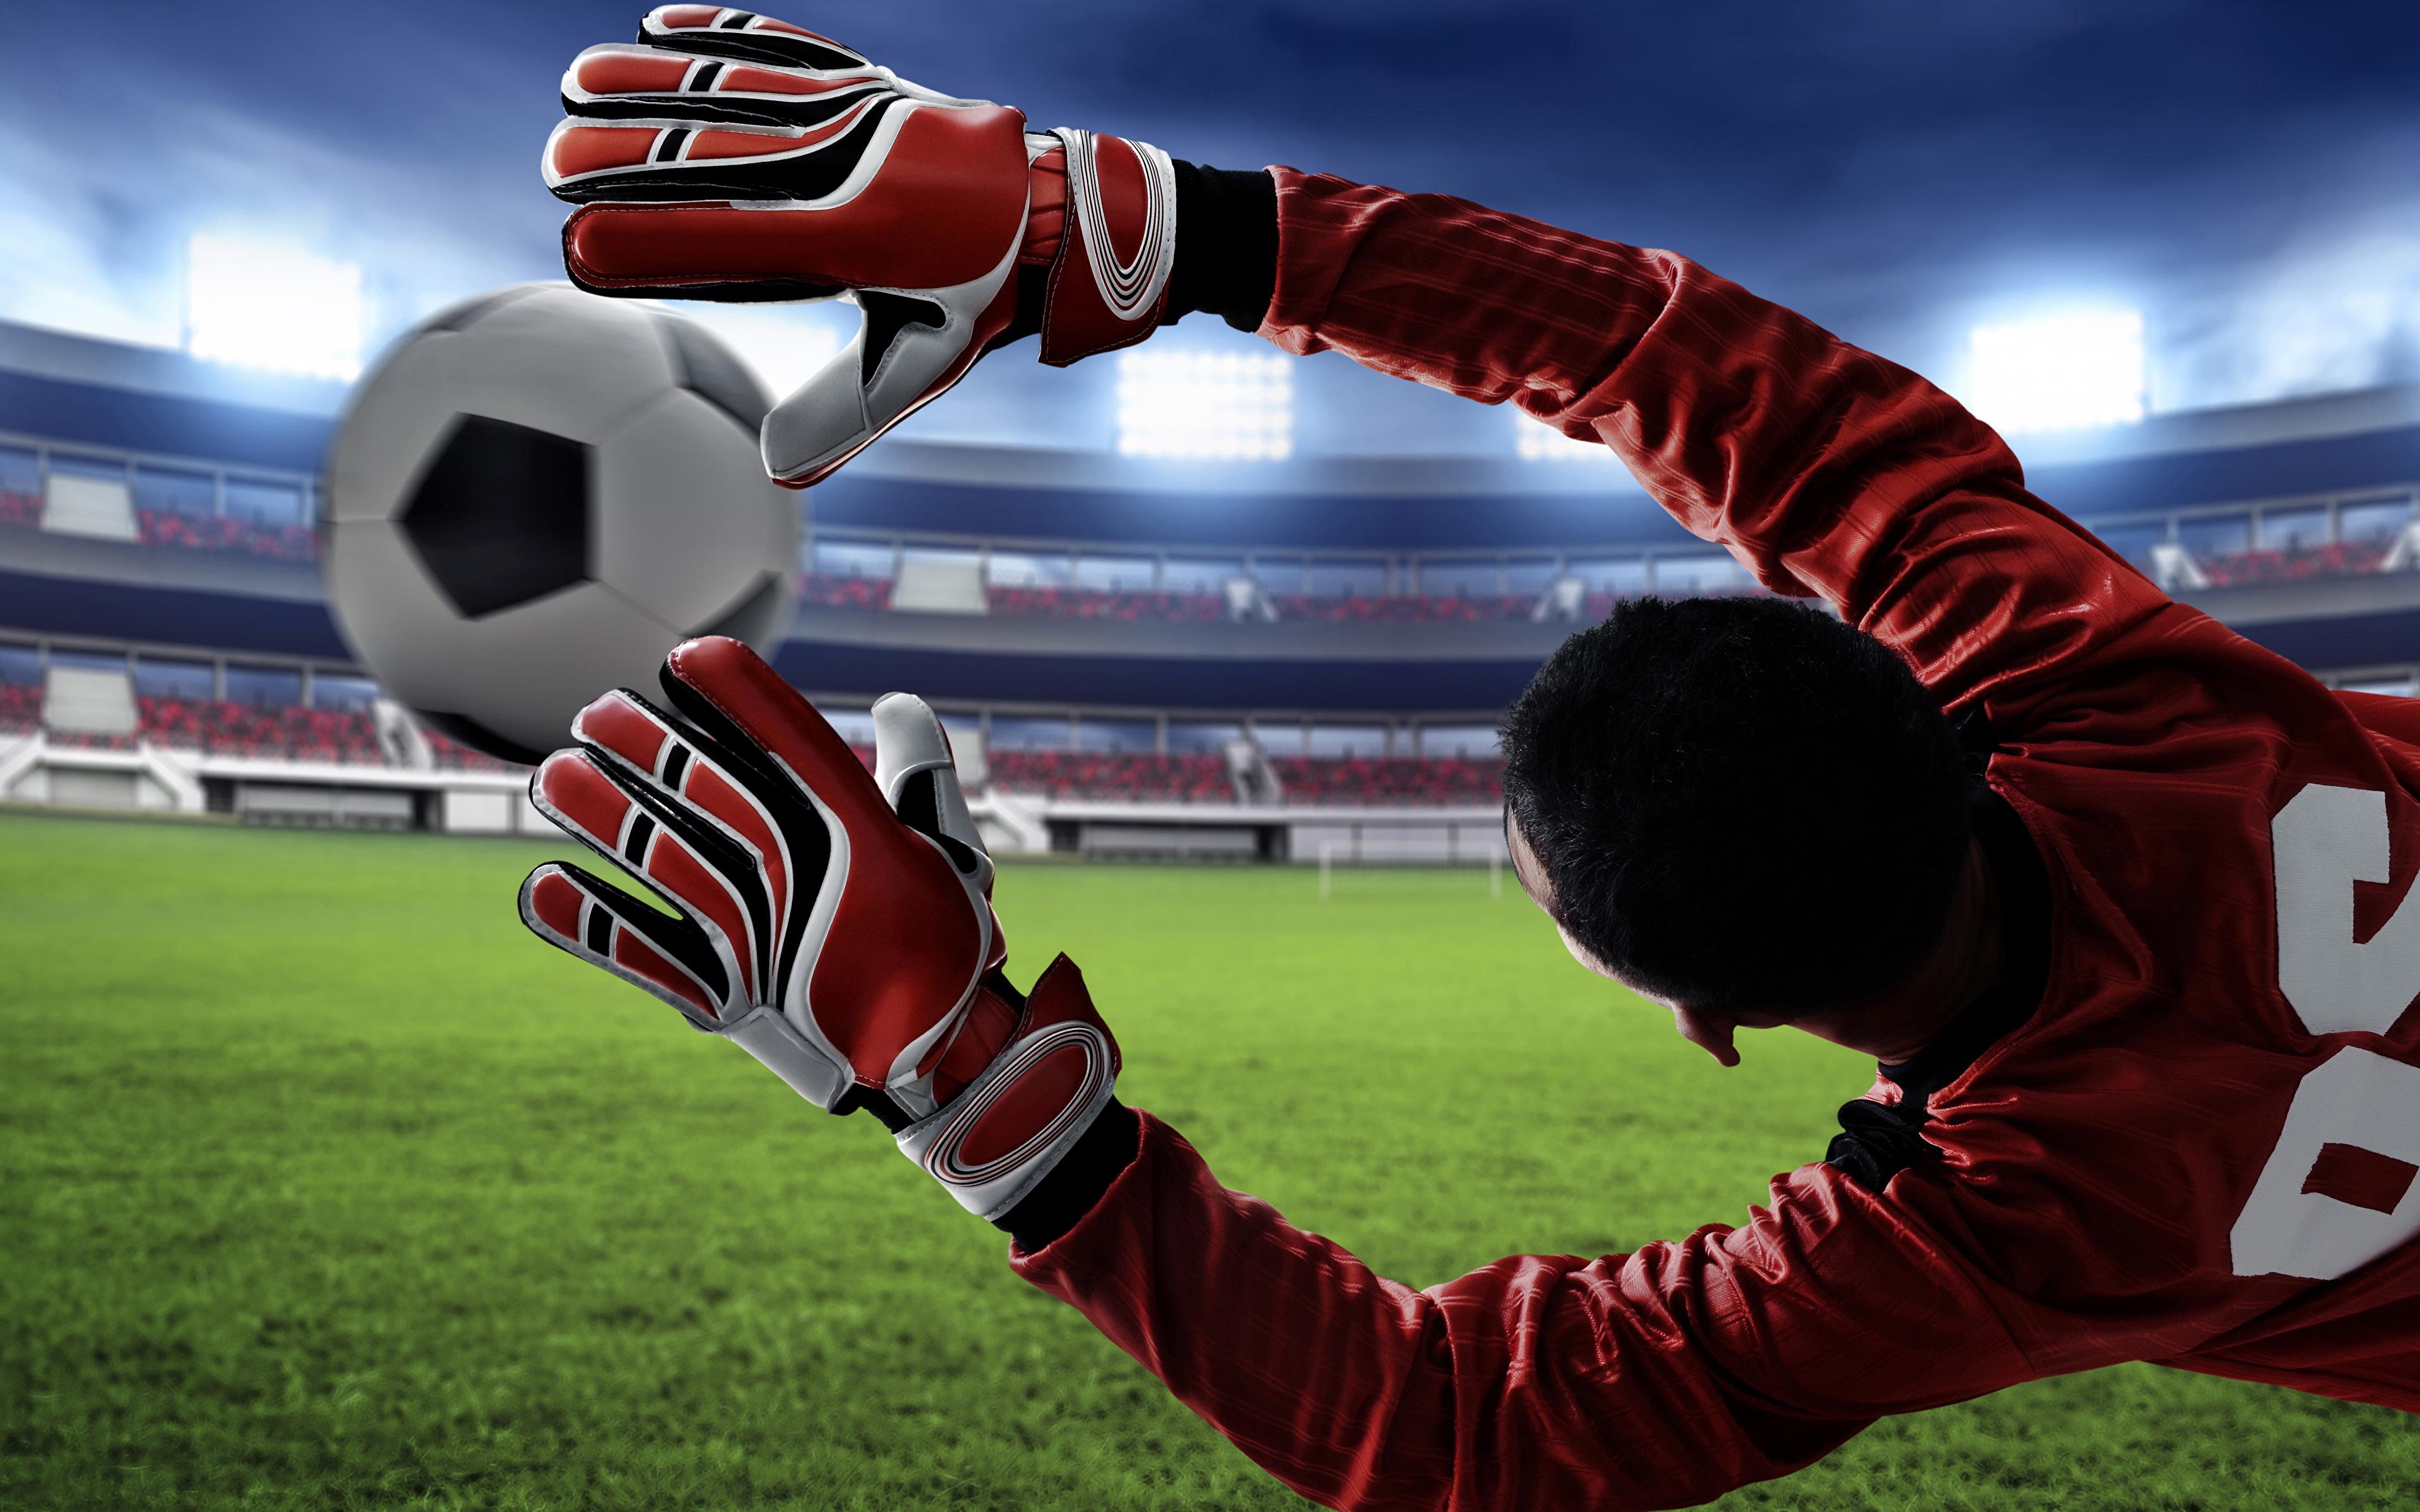 Picture Glove Goalkeeper football sports Footbal Jump 3840x2400 3840x2400